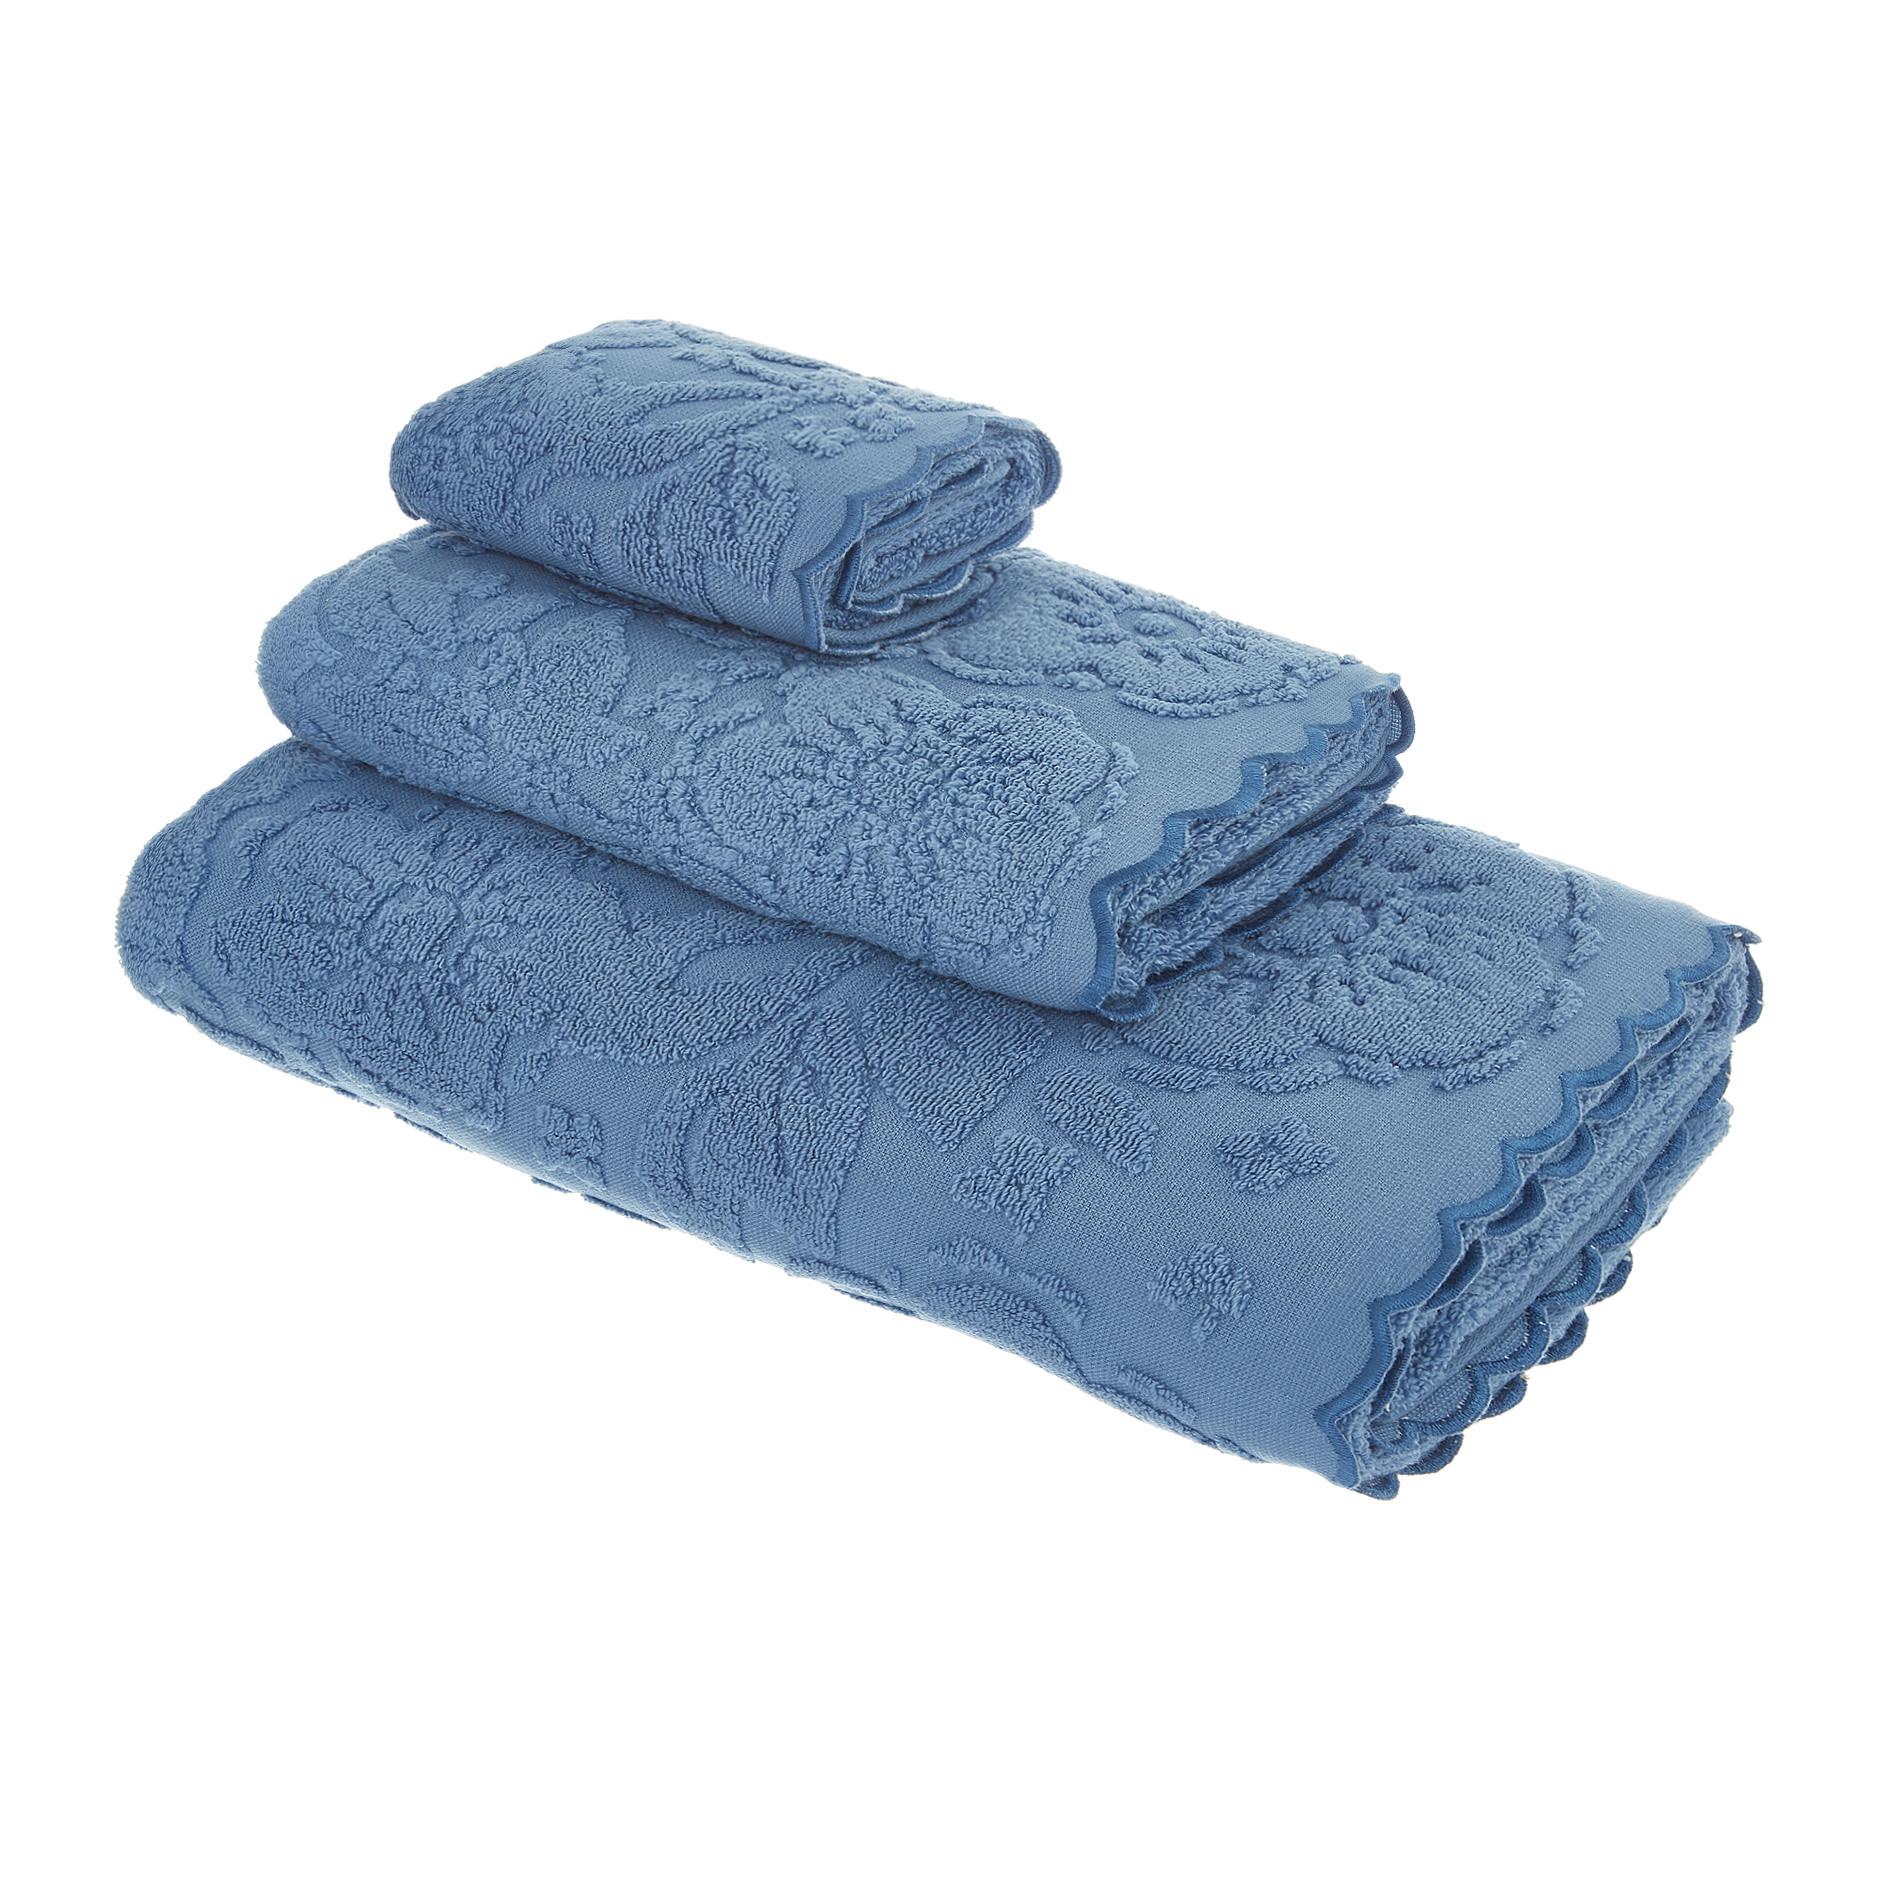 Asciugamano spugna di cotone bordo jacquard, Blu, large image number 0